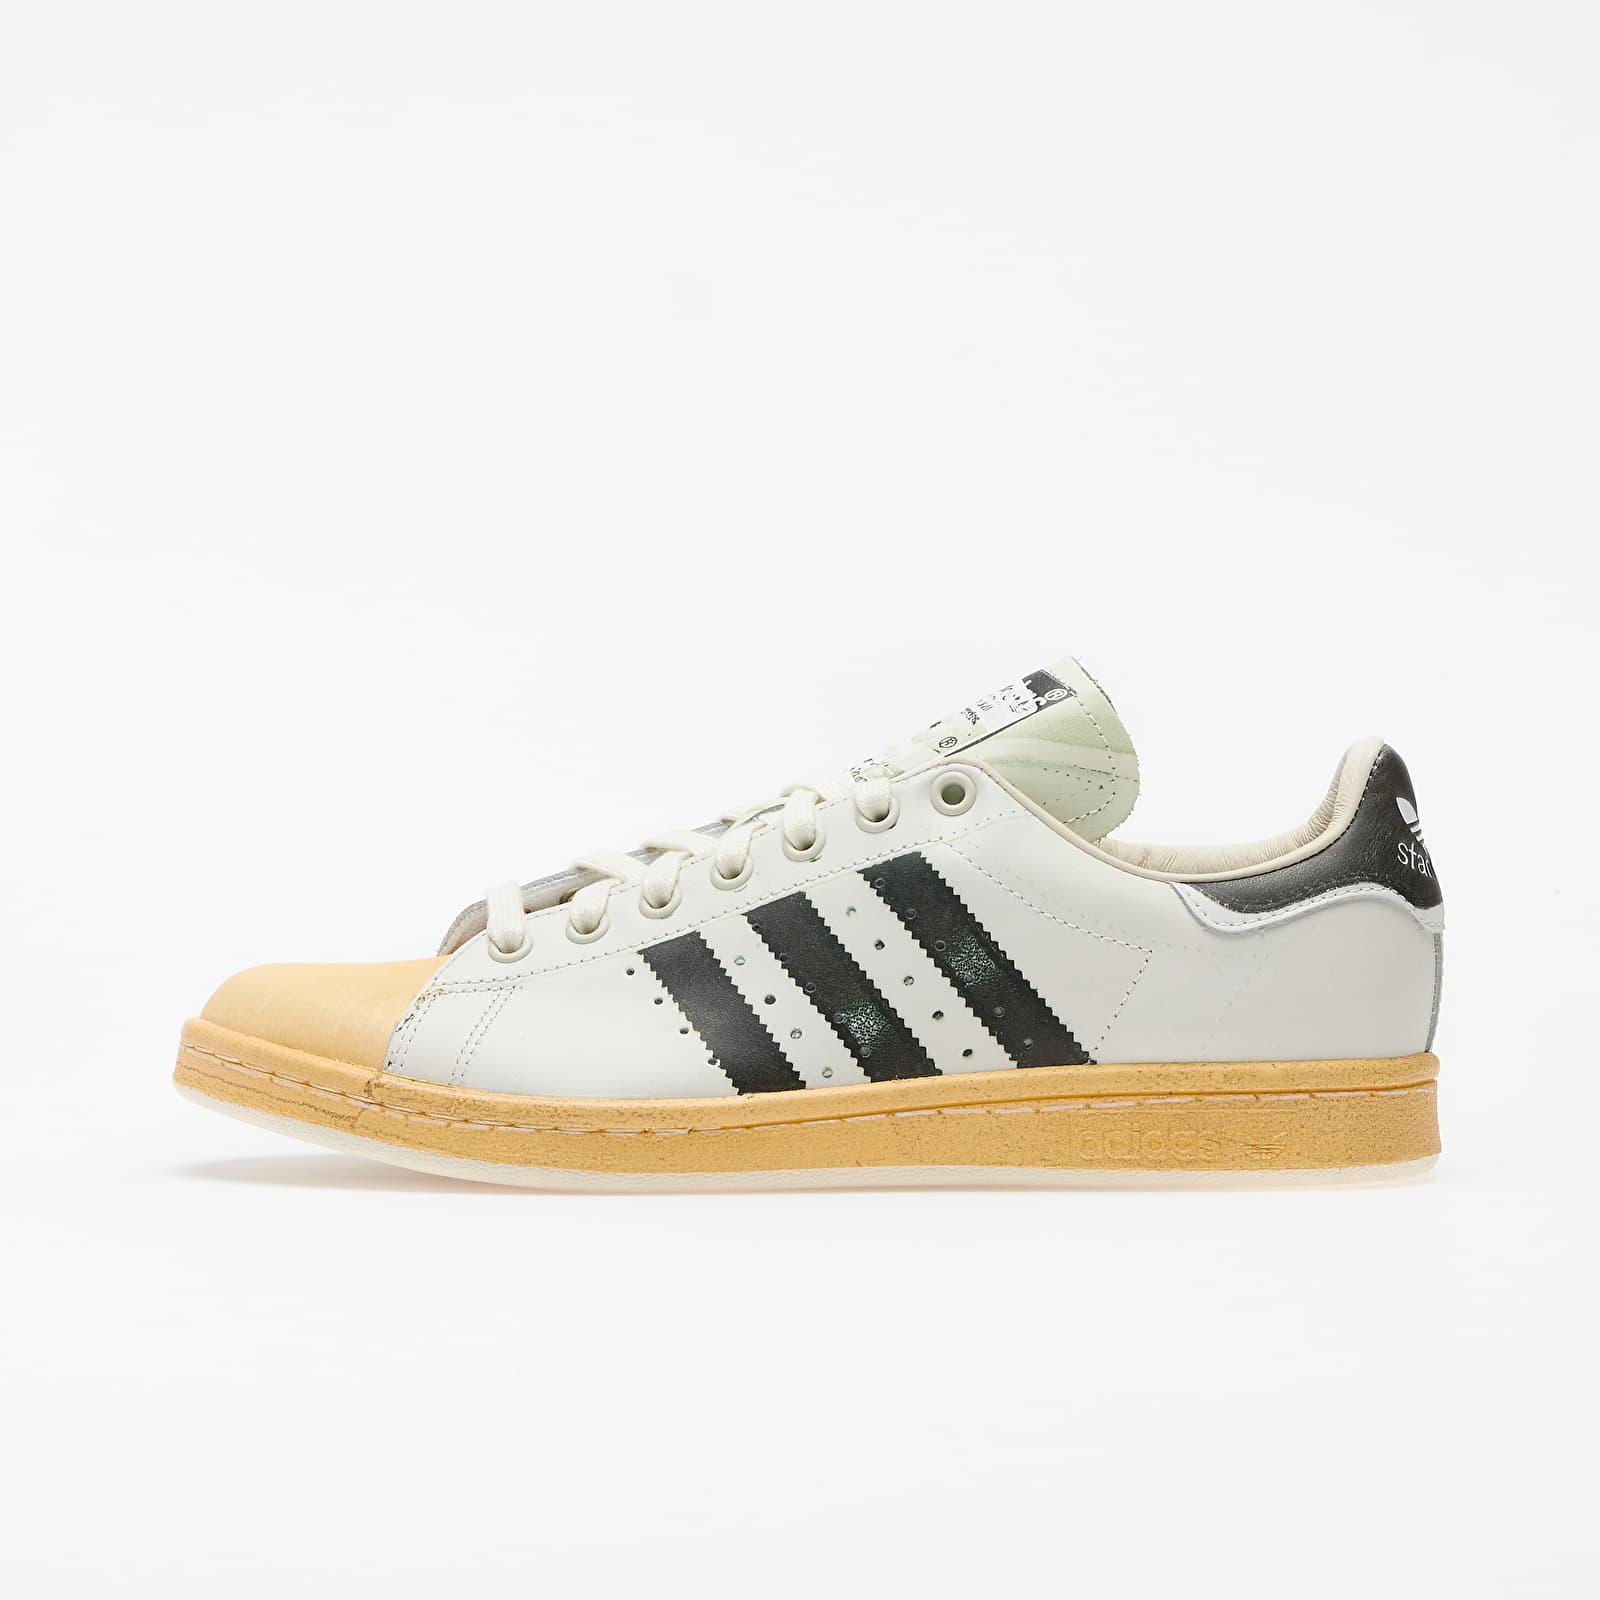 Men's shoes adidas Stan Smith Superstan Ftw White/ Core Black/ Off White